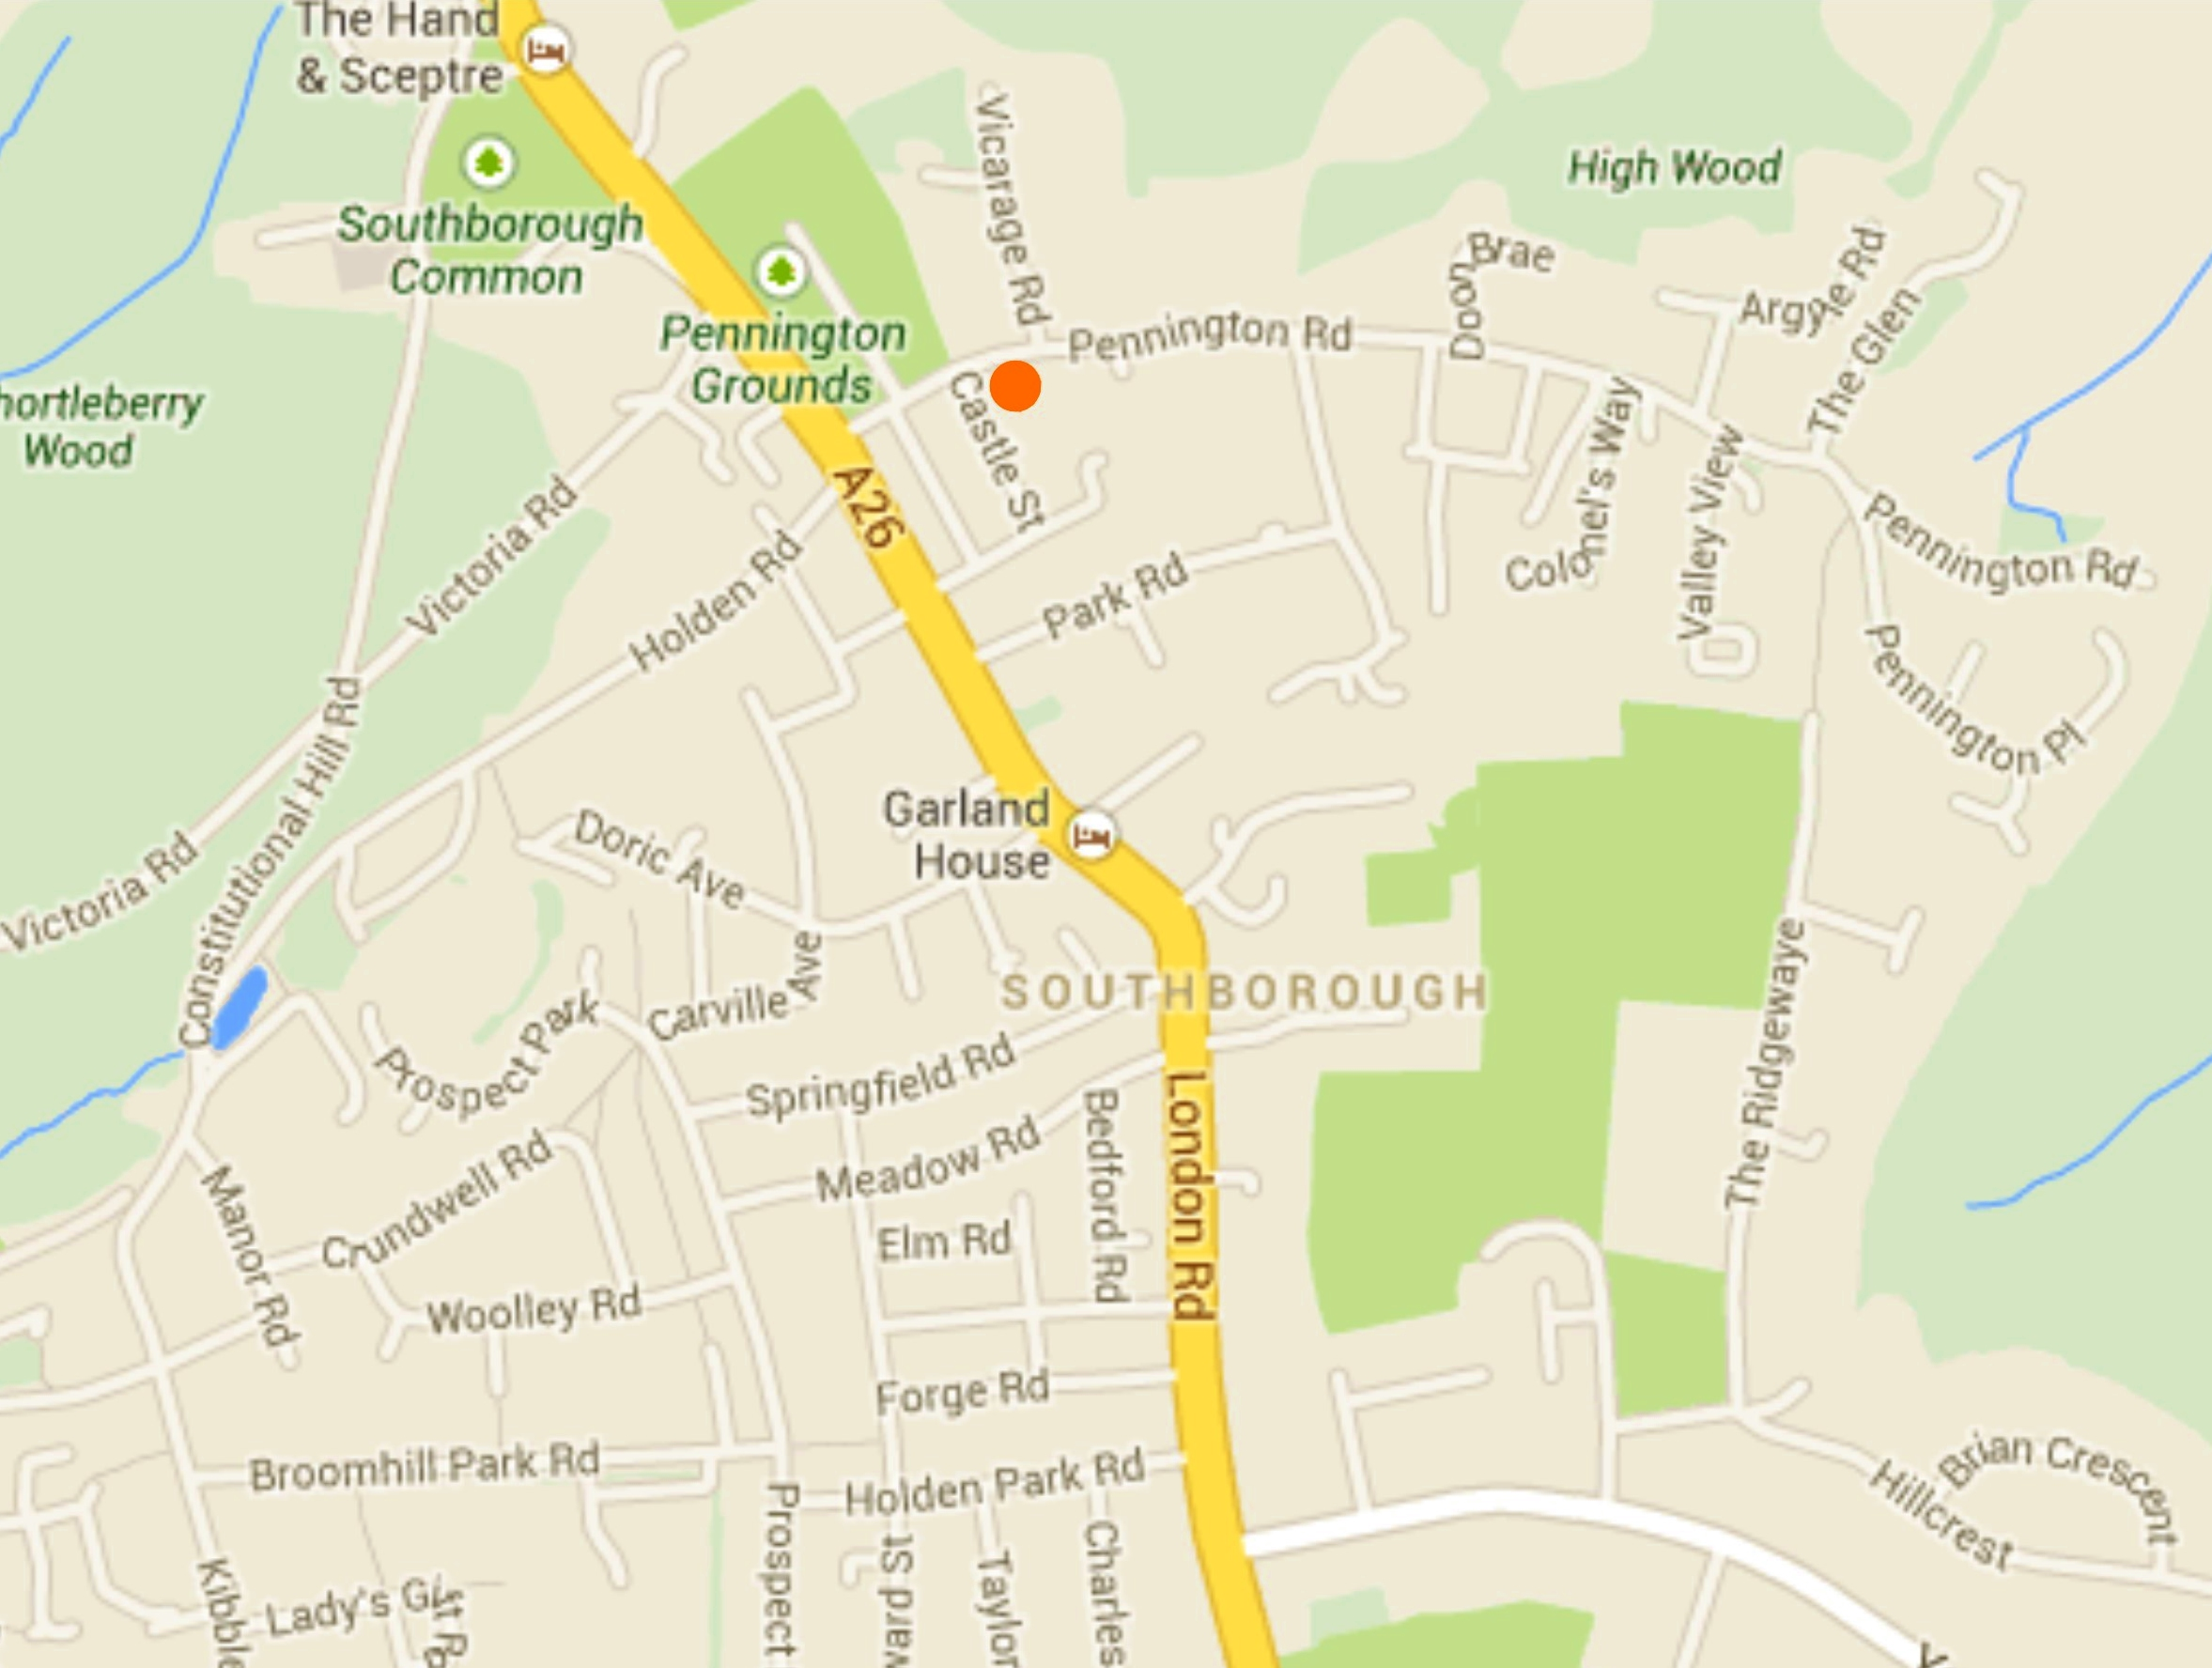 Ralph USherwood's house - Location from Google Maps